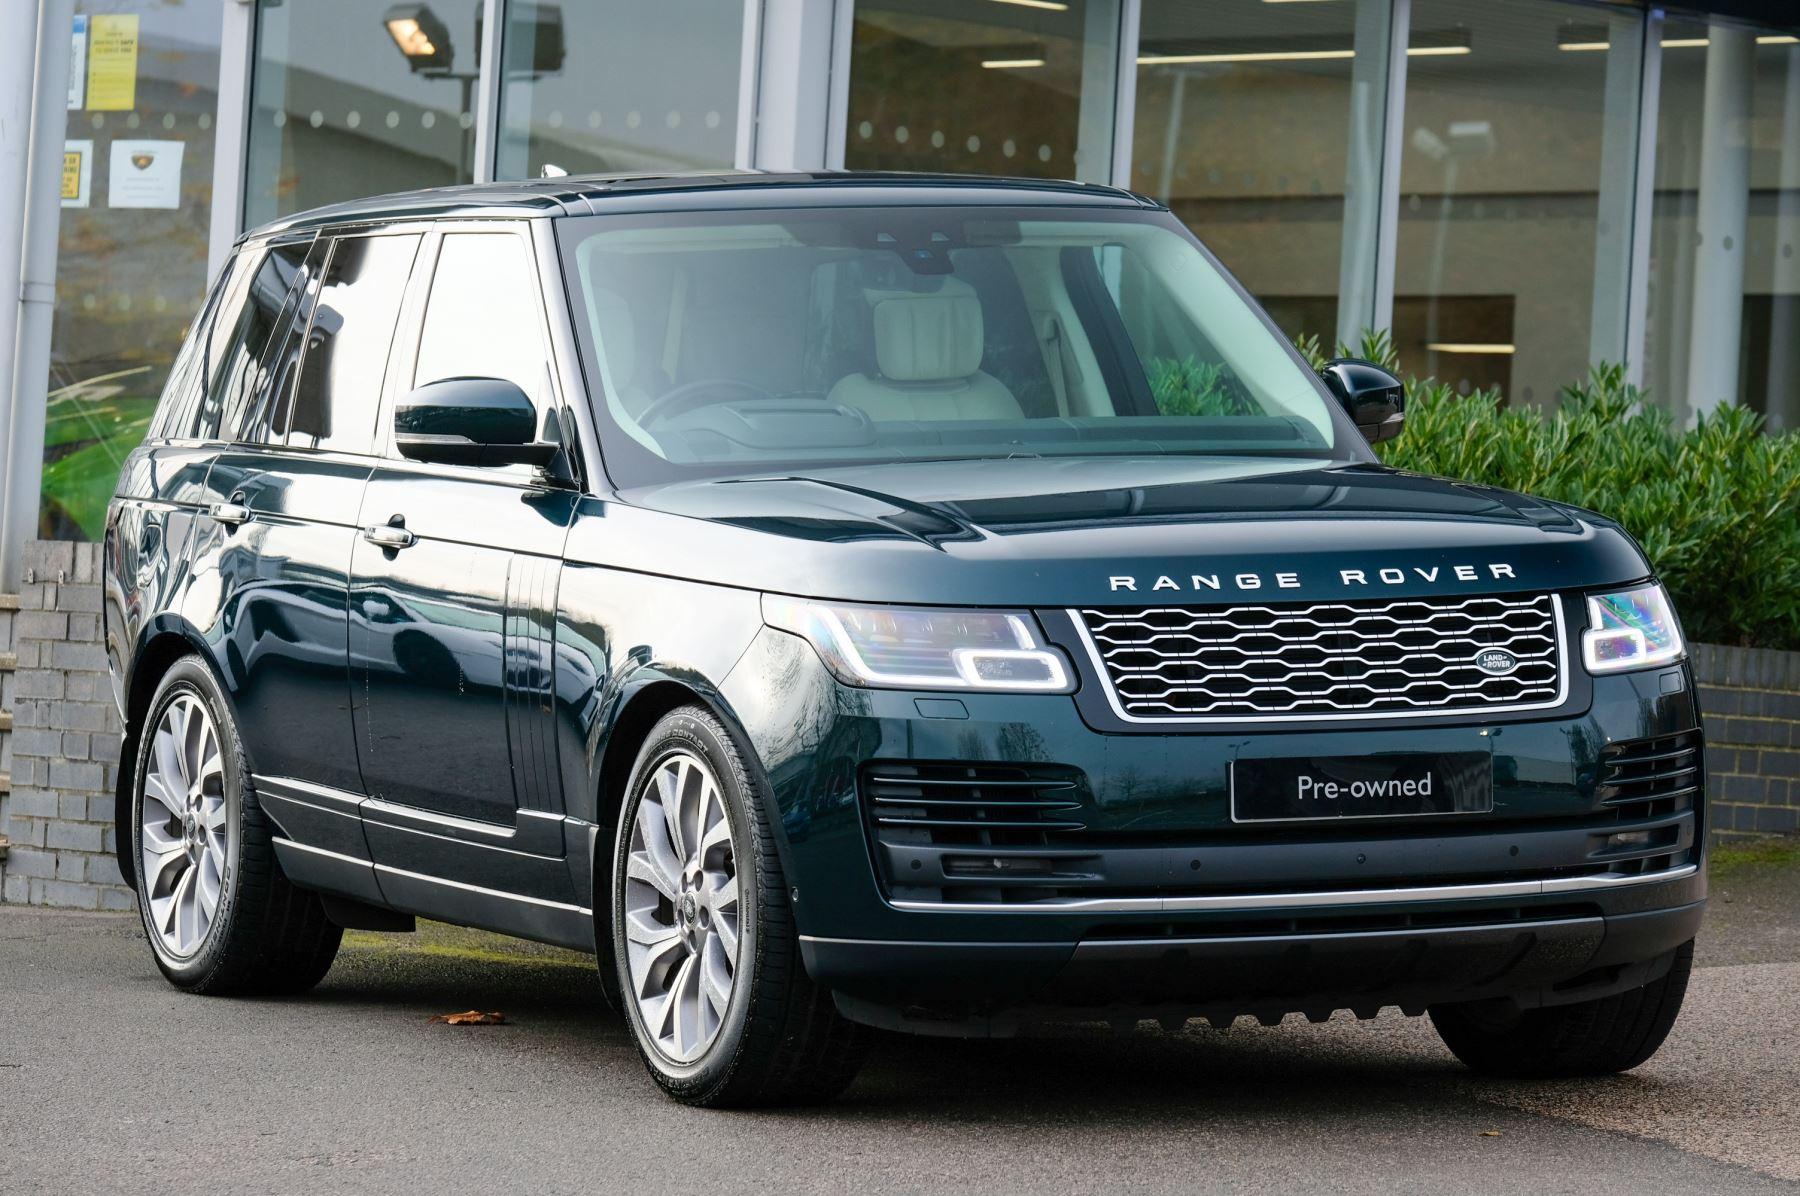 Land Rover Range Rover 5.0 V8 S/C Autobiography 4dr Automatic 5 door Estate (2019)